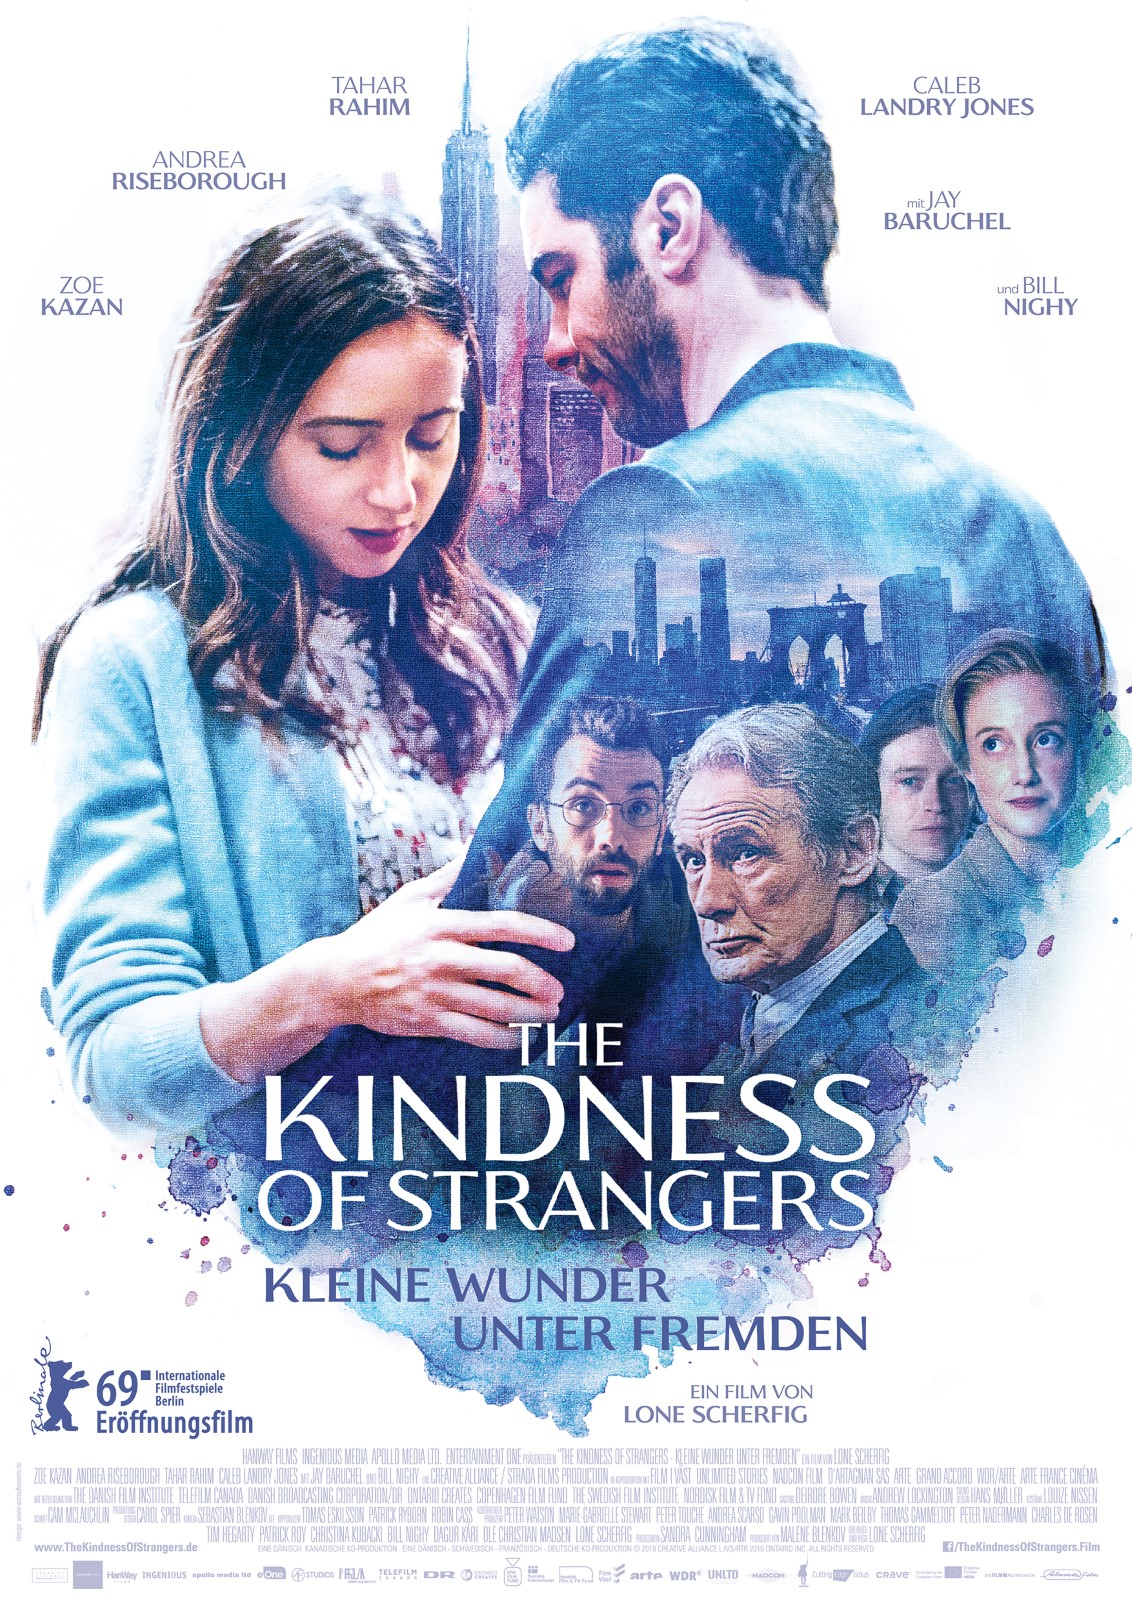 The Kindness of Strangers (2019) Dual Audio 720p BluRay [Hindi + English] Download